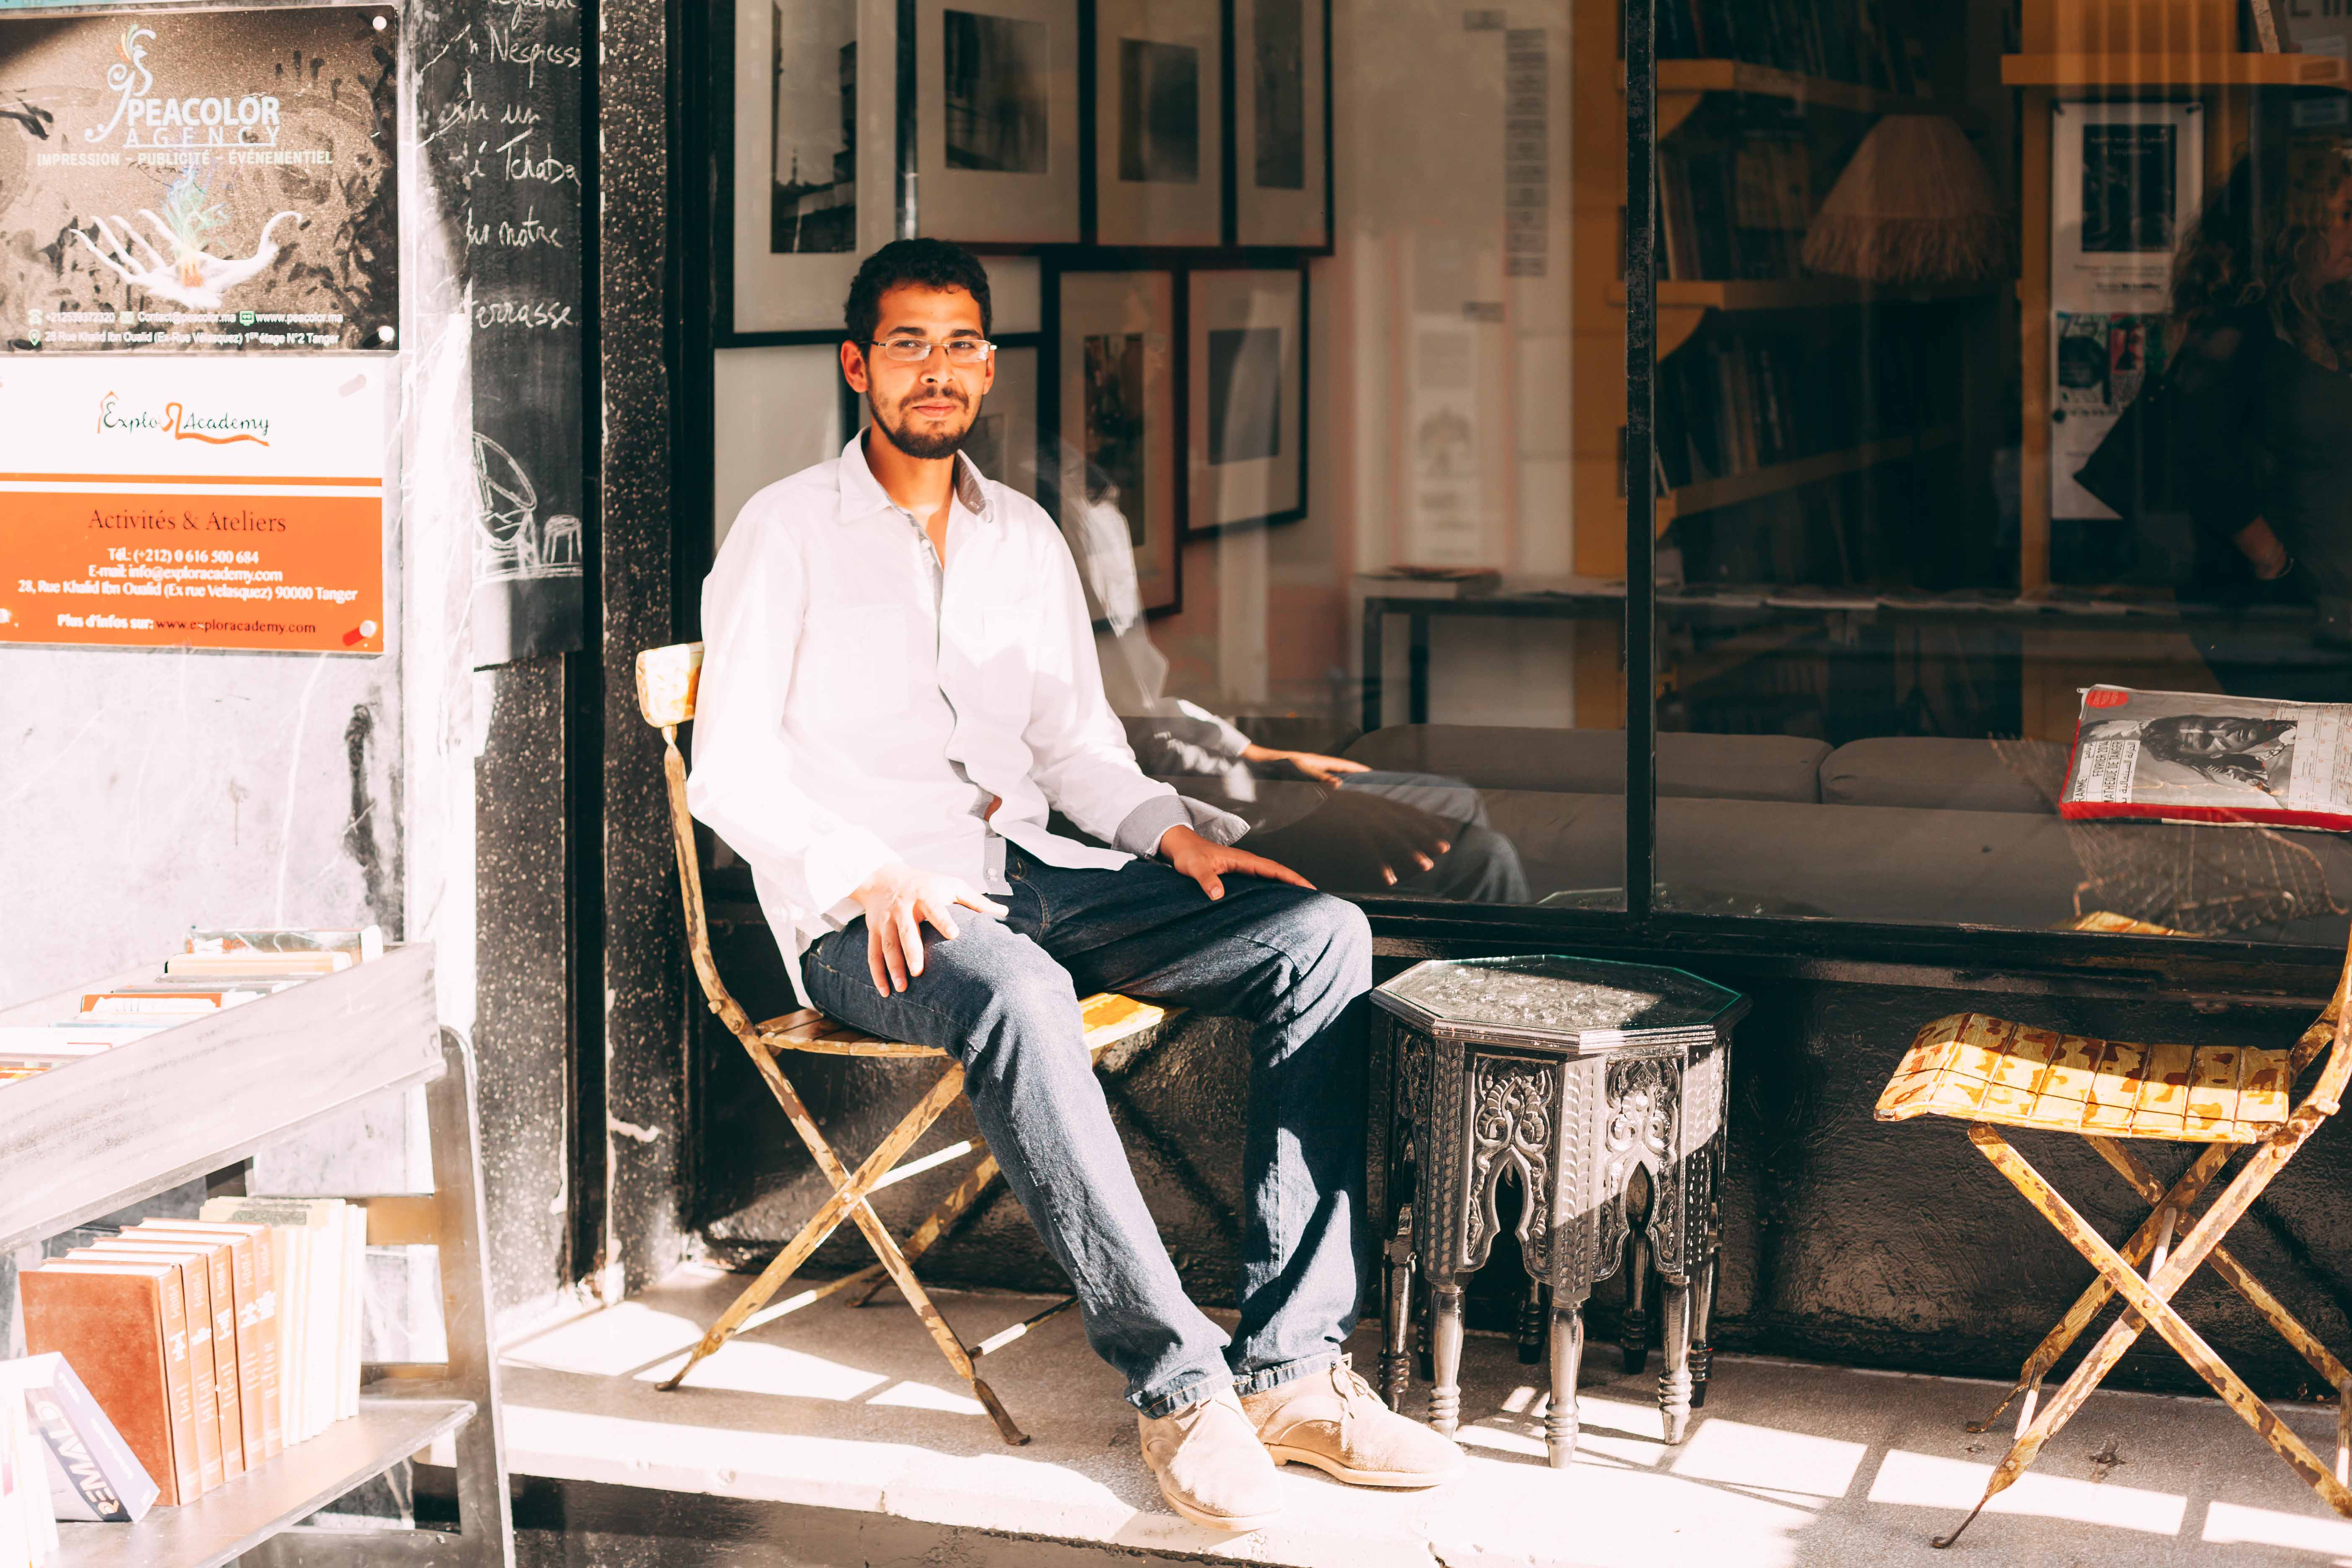 Yassine Chouati © Mehdi Drissi / ONORIENTOUR